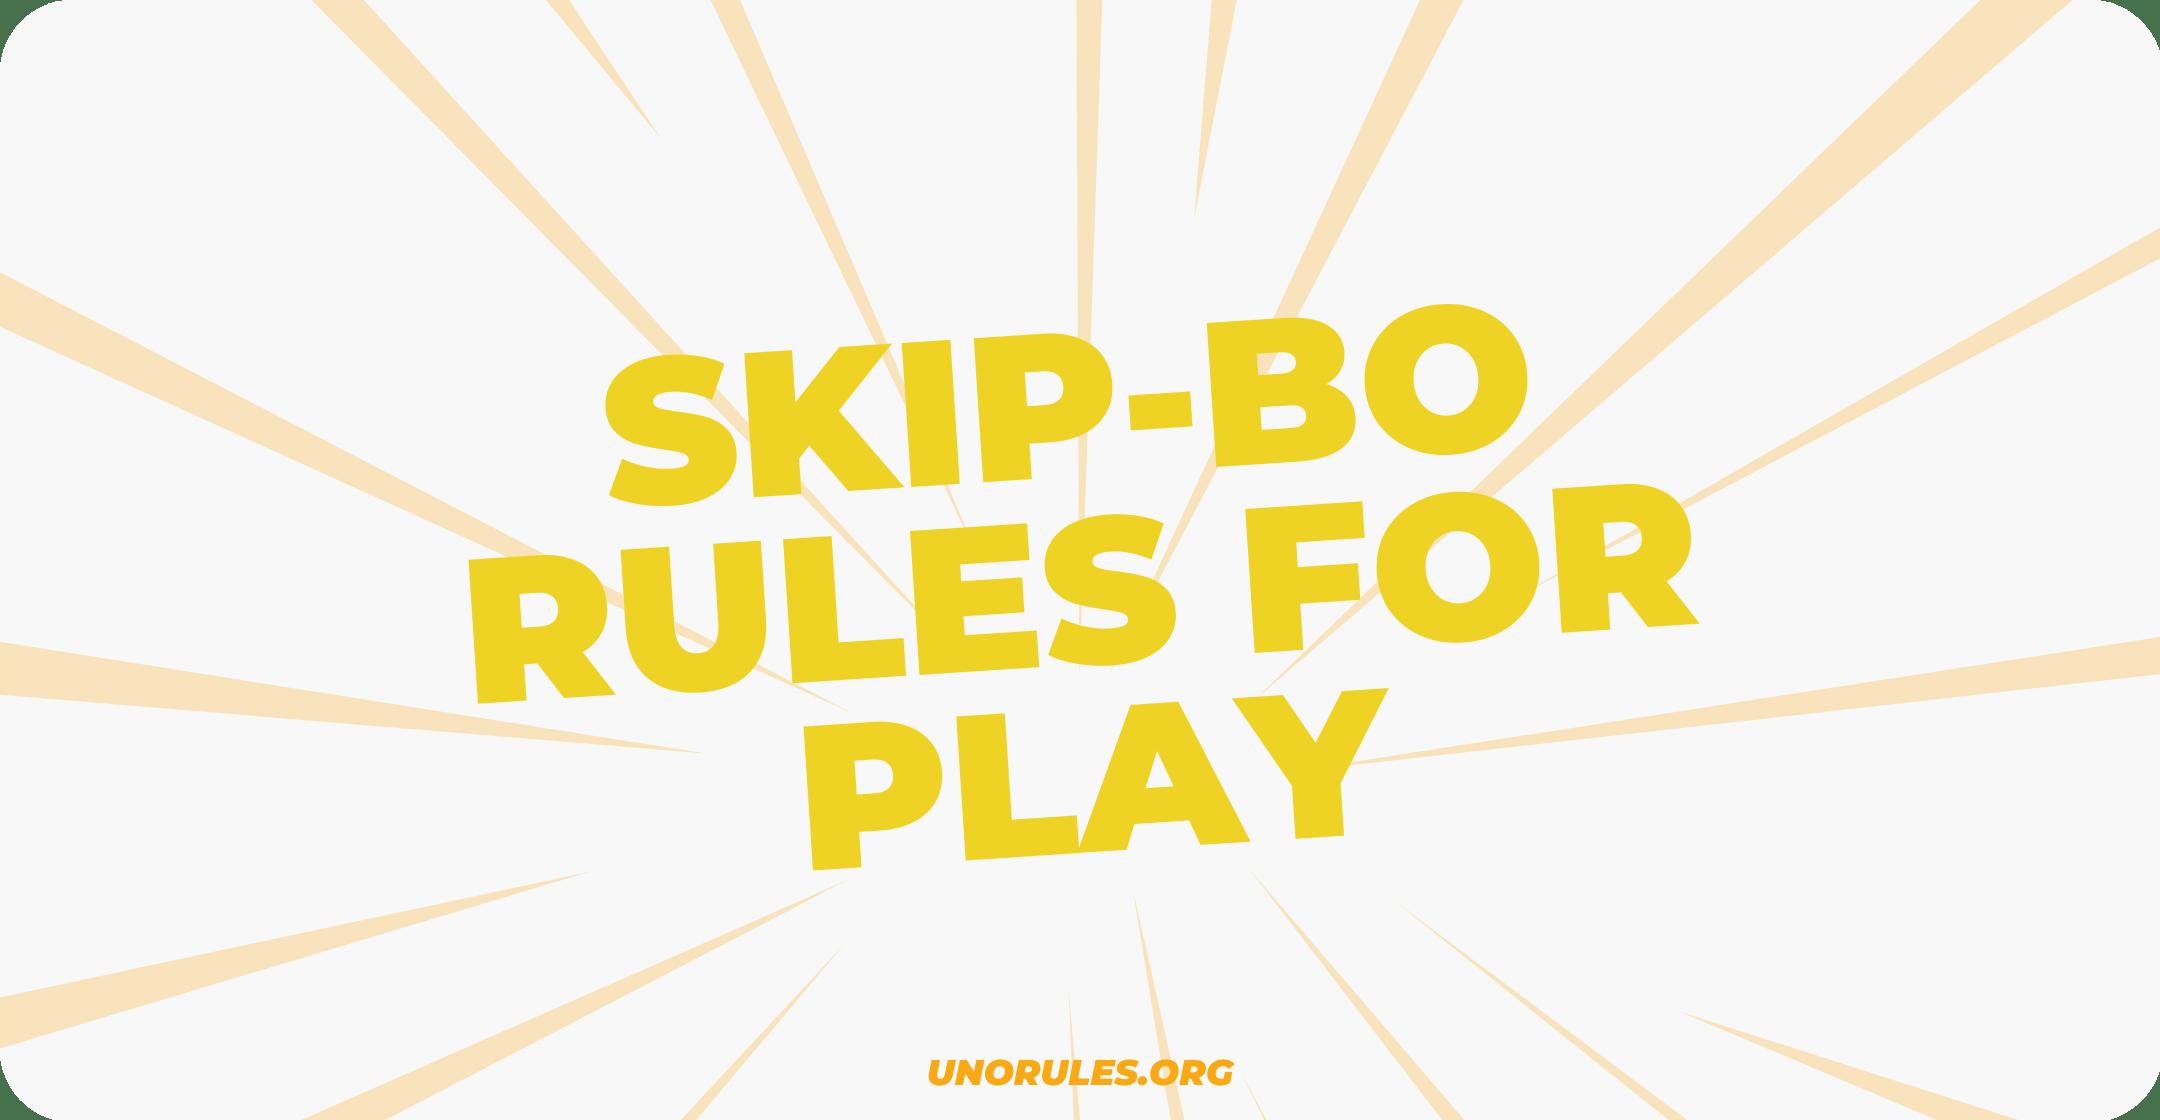 Skip-Bo rules for play